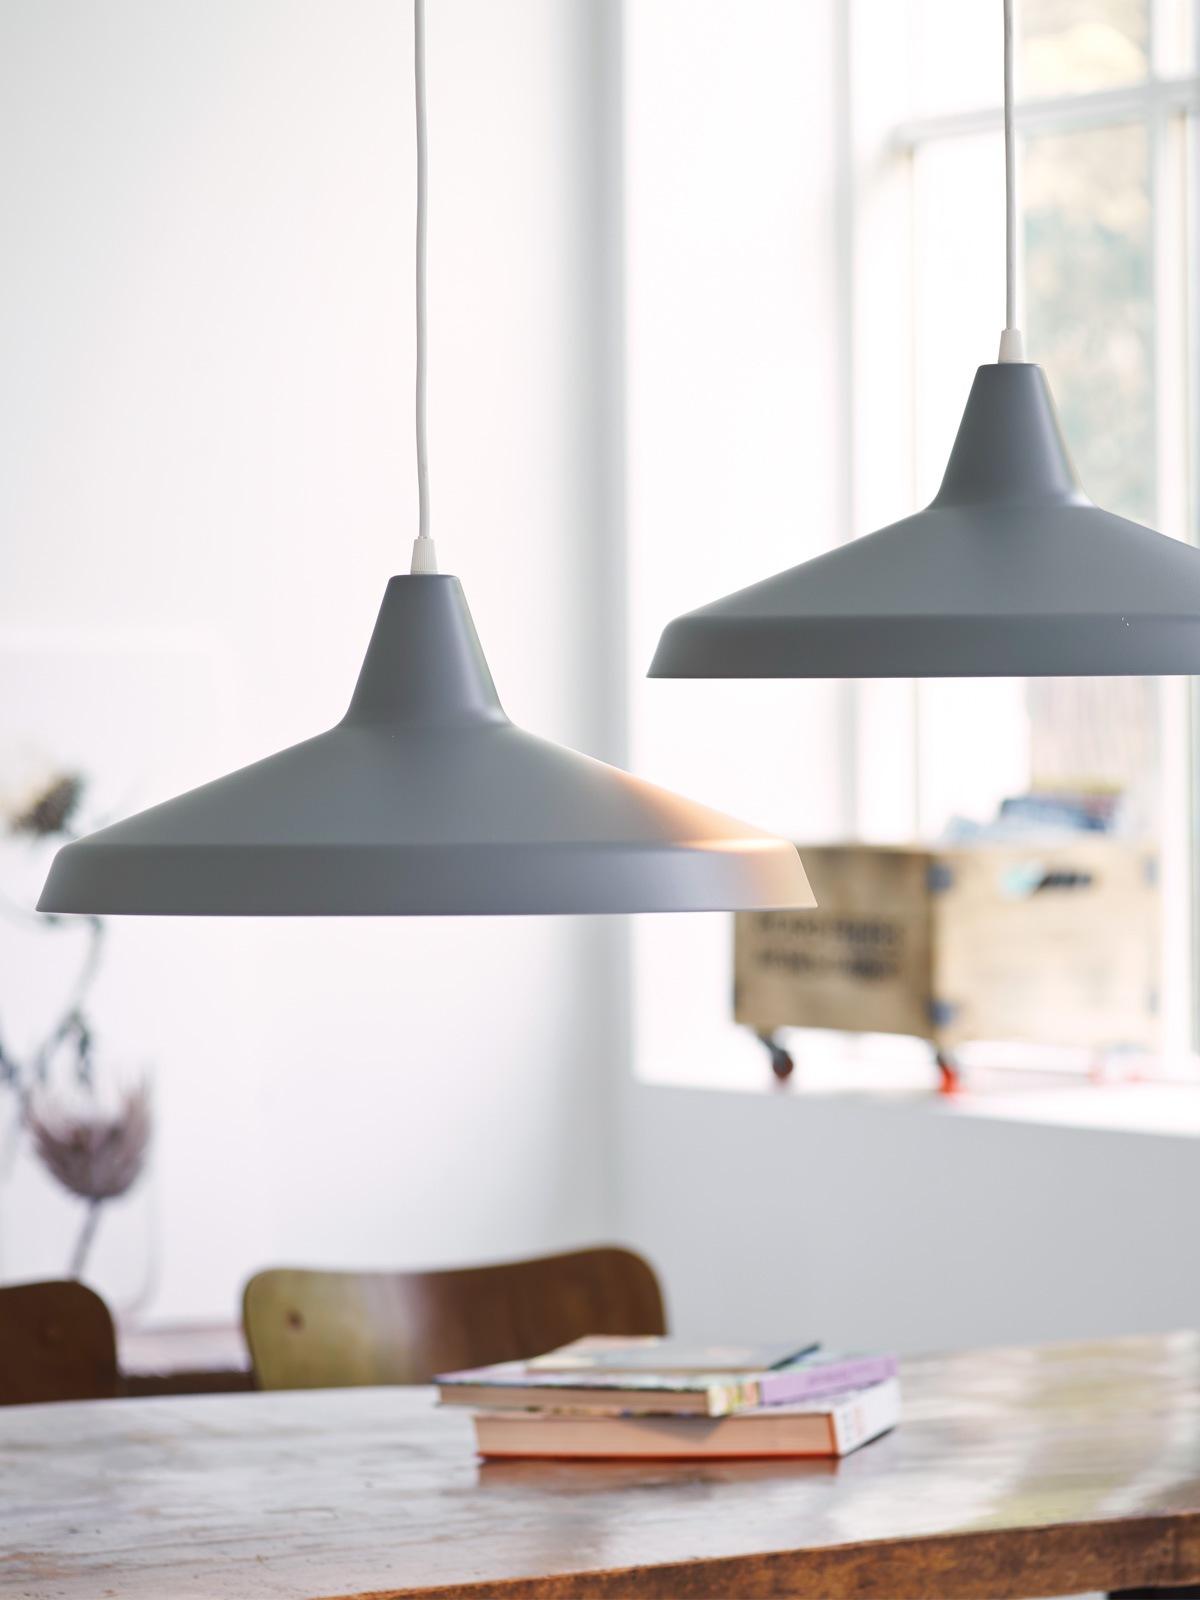 DesignOrt Blog: Industrielampen & Leuchten Titan Pendel Leuchte Belid DesignOrt Lampen Onlineshop Berlin